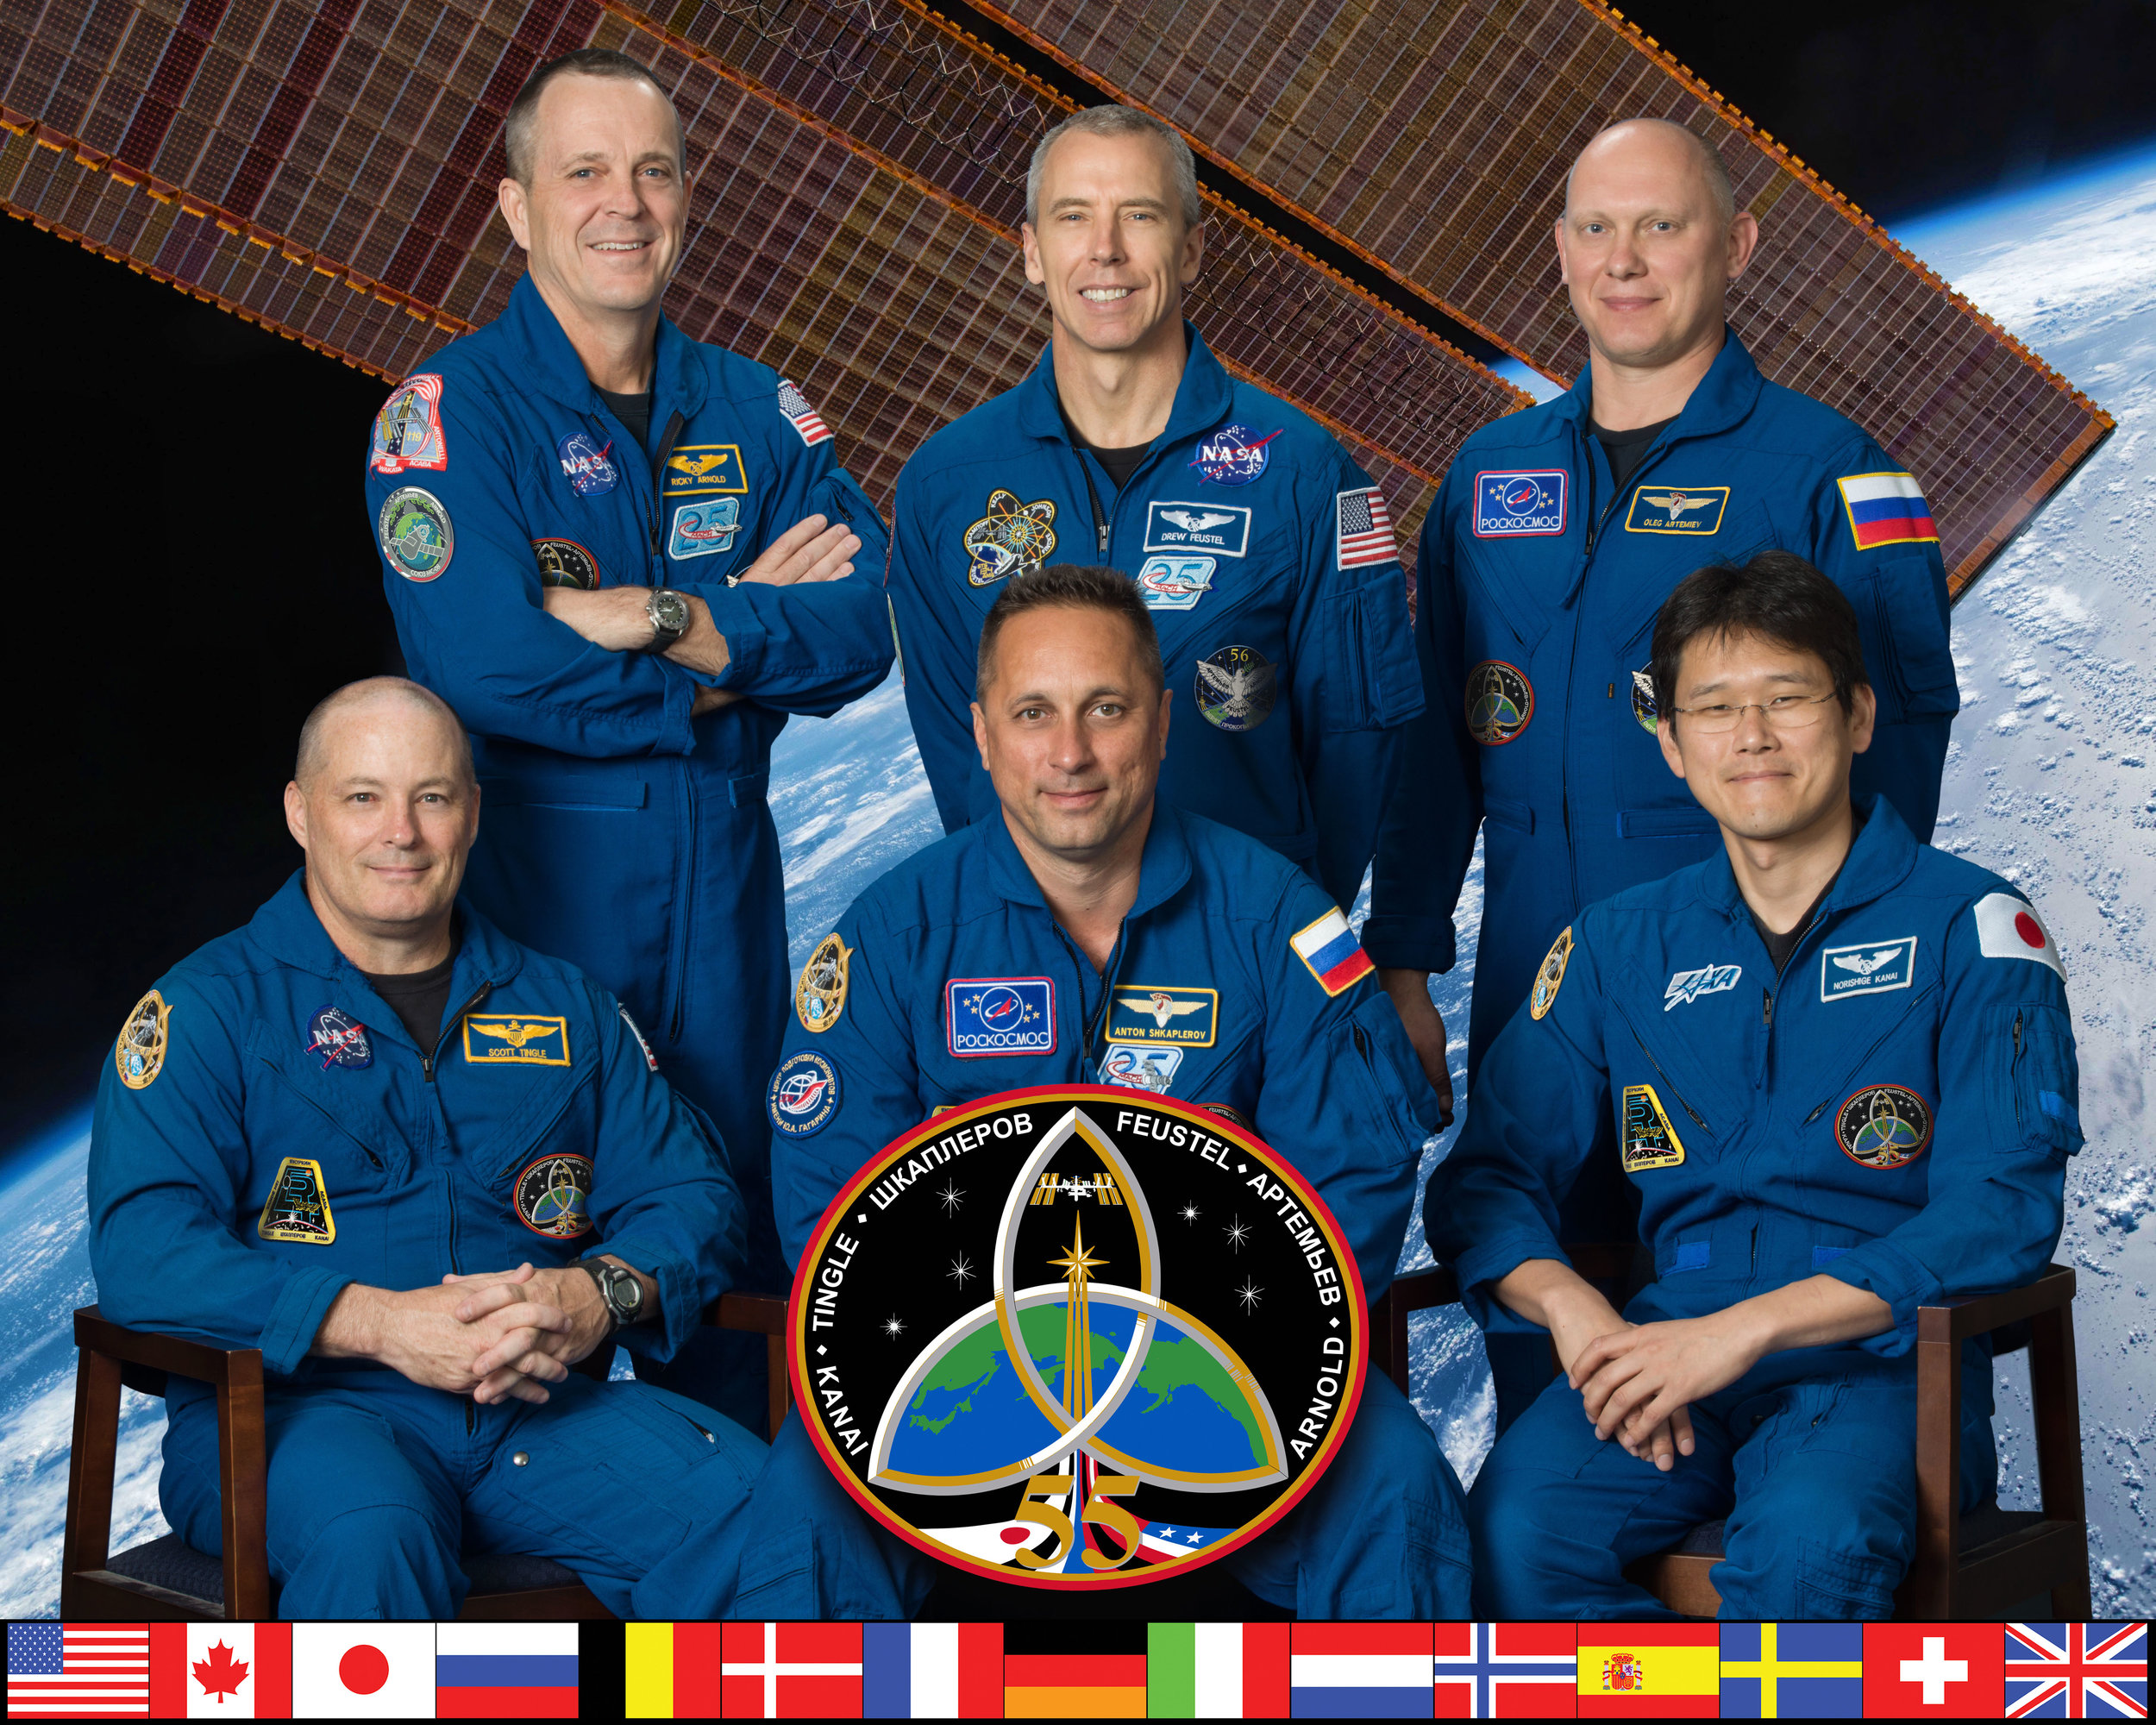 Expedition_55_crew_portrait.jpg